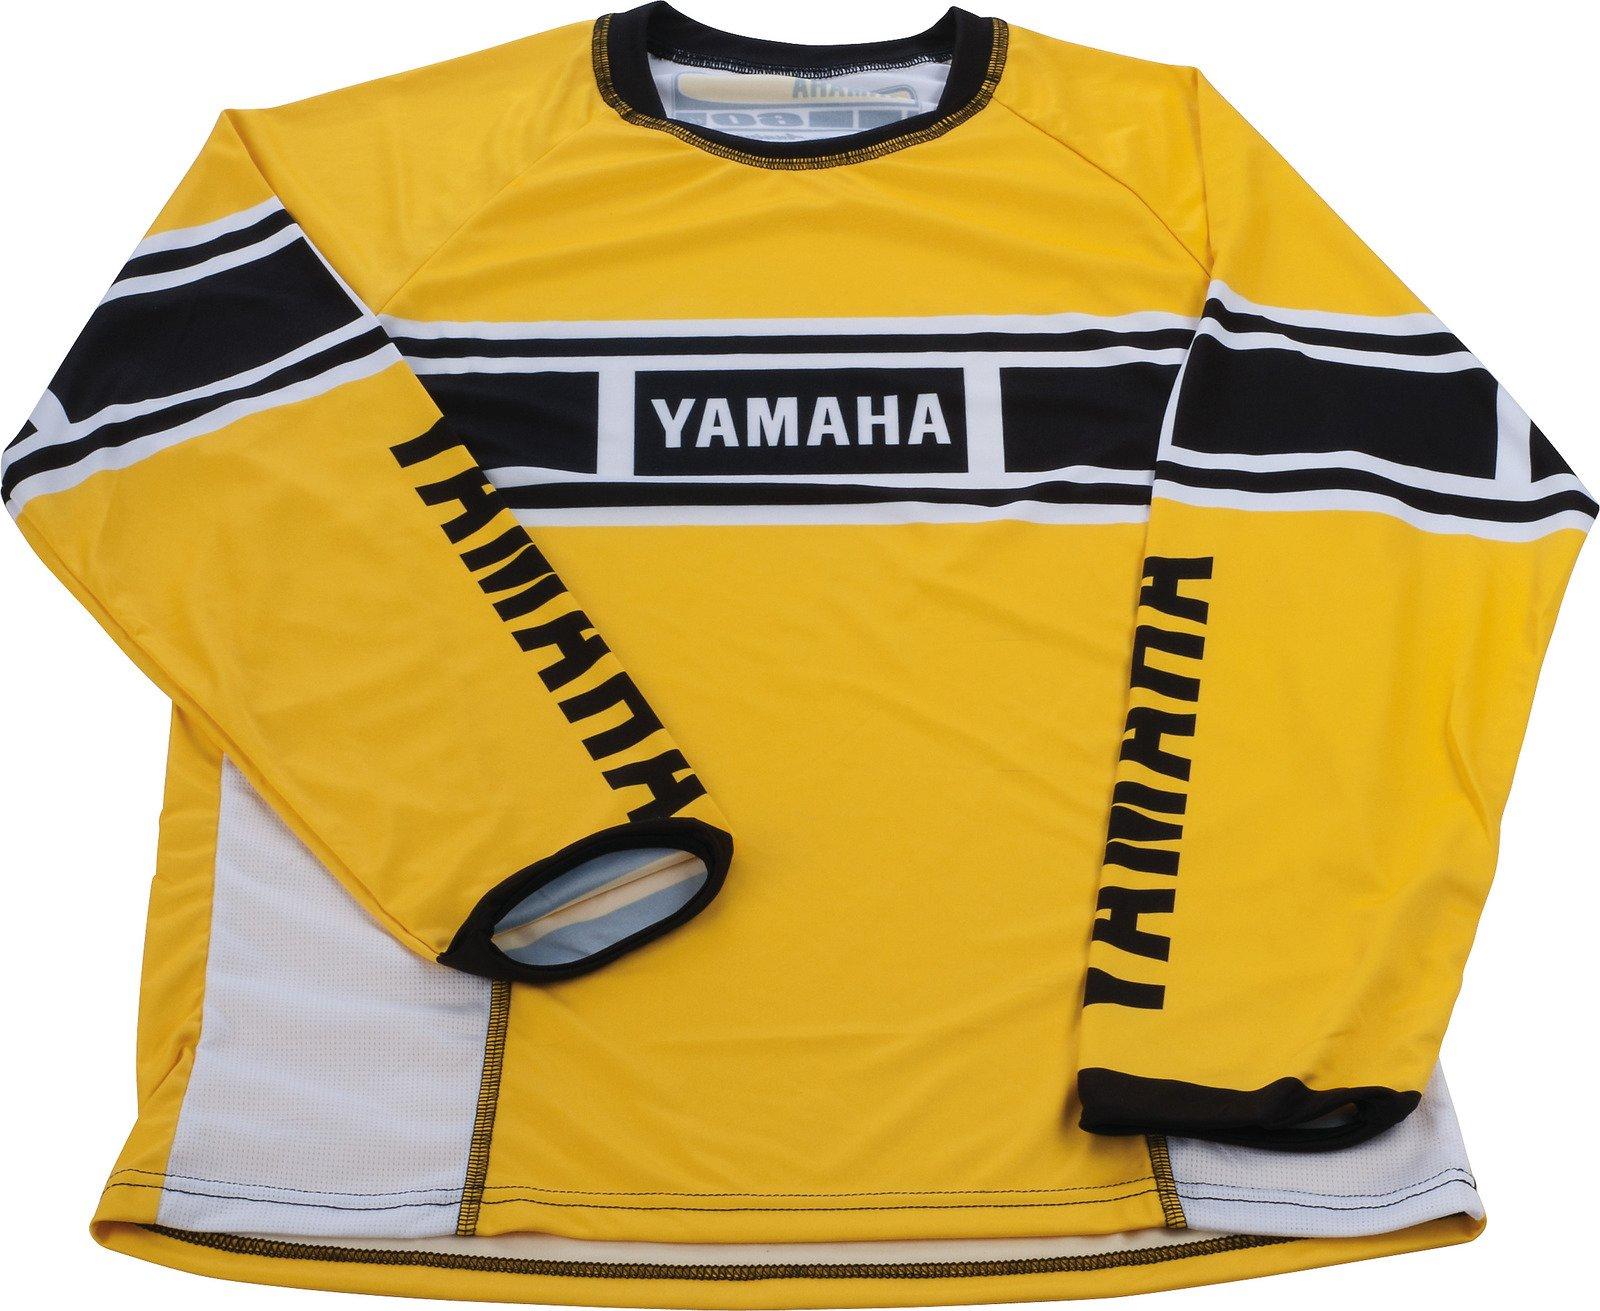 Yamaha 60th Anniversary Long Sleeve T-Shirt (Men's) 100% Cotton 70027